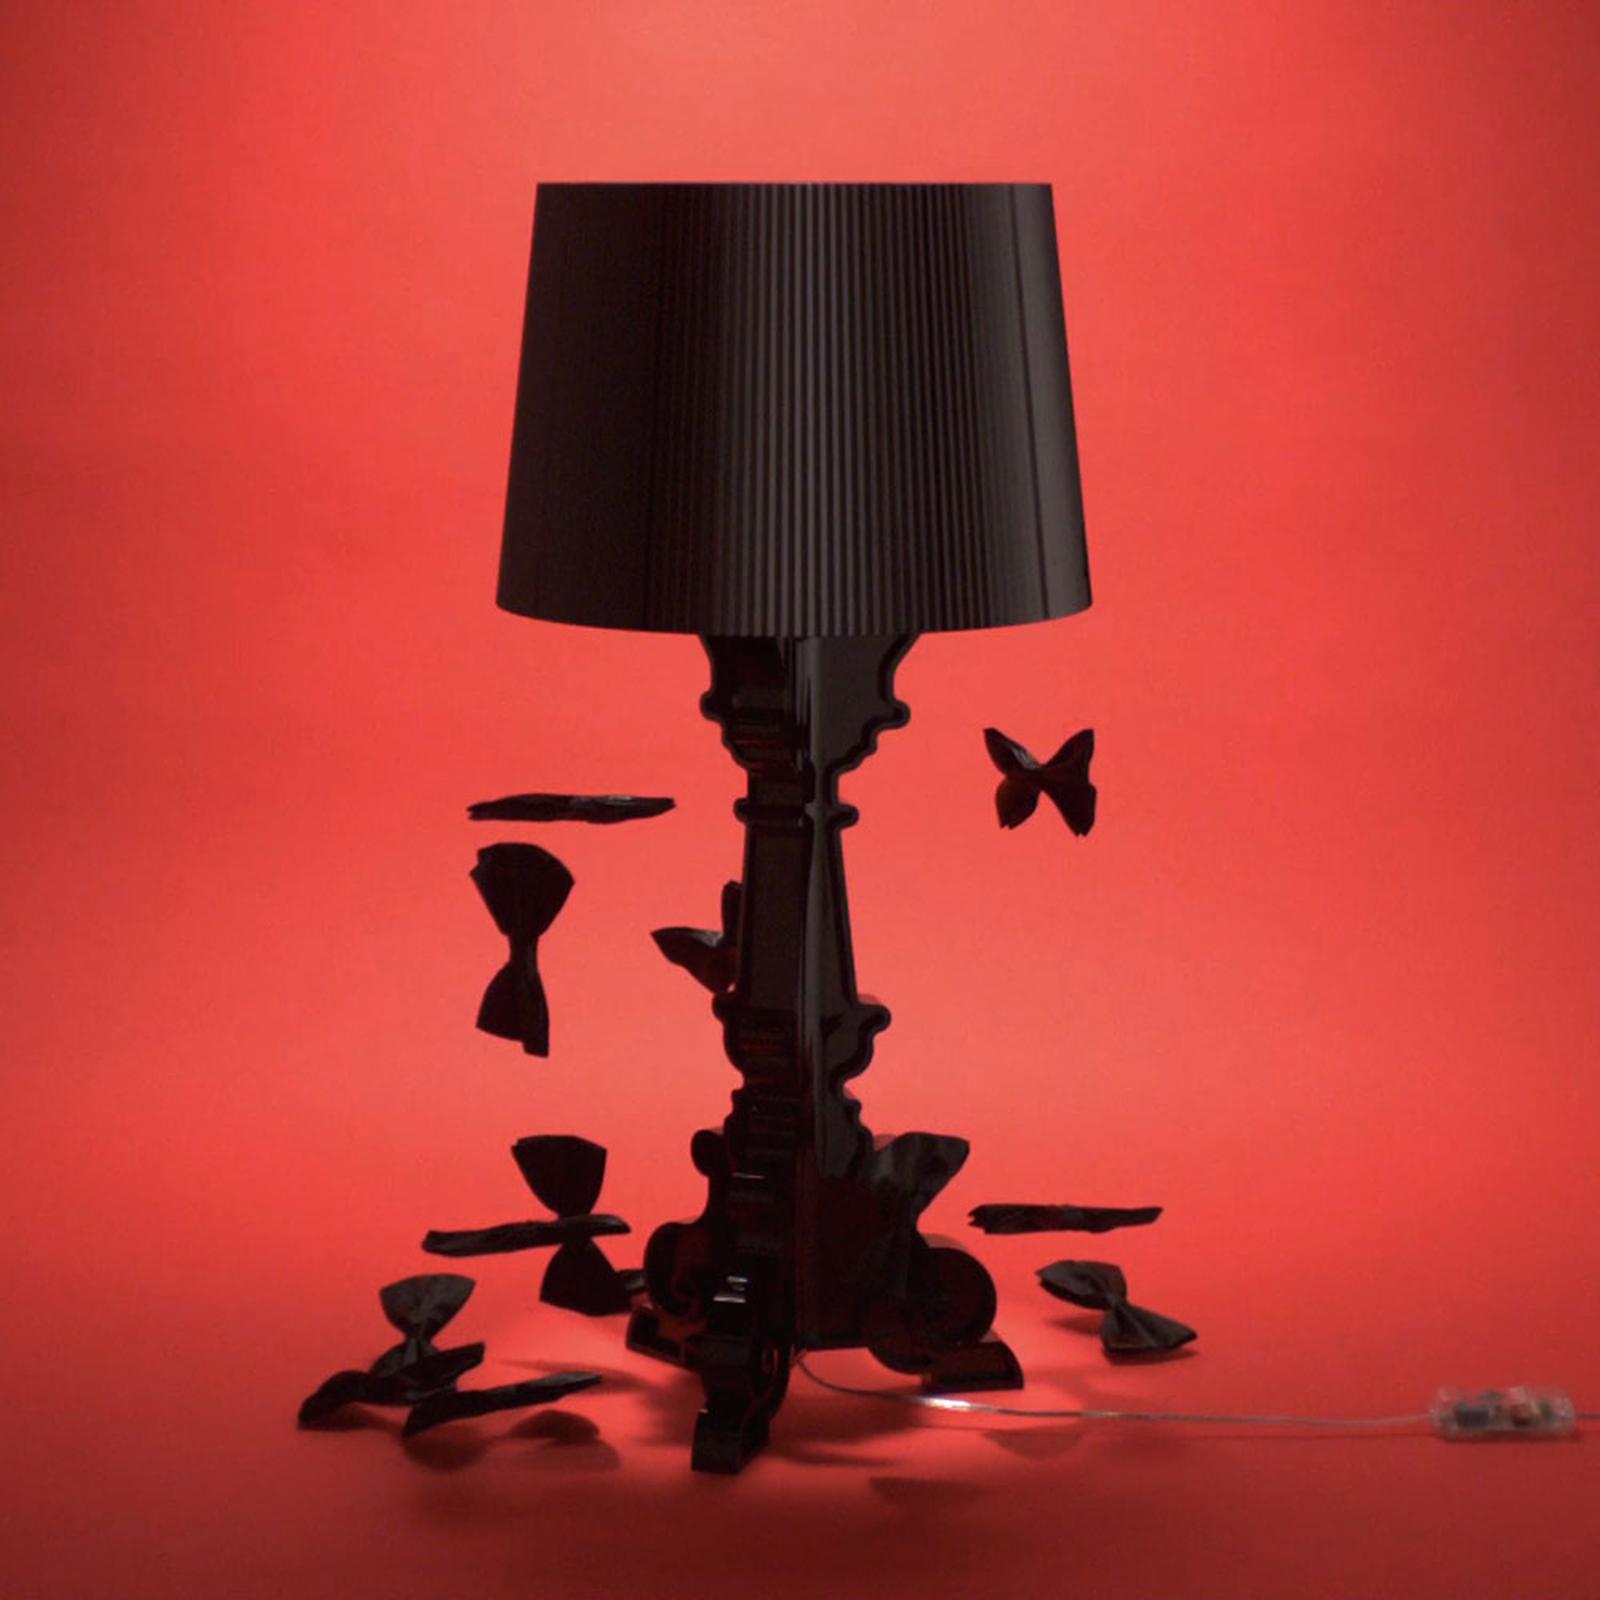 Kartell Bourgie lampe à poser LED noire